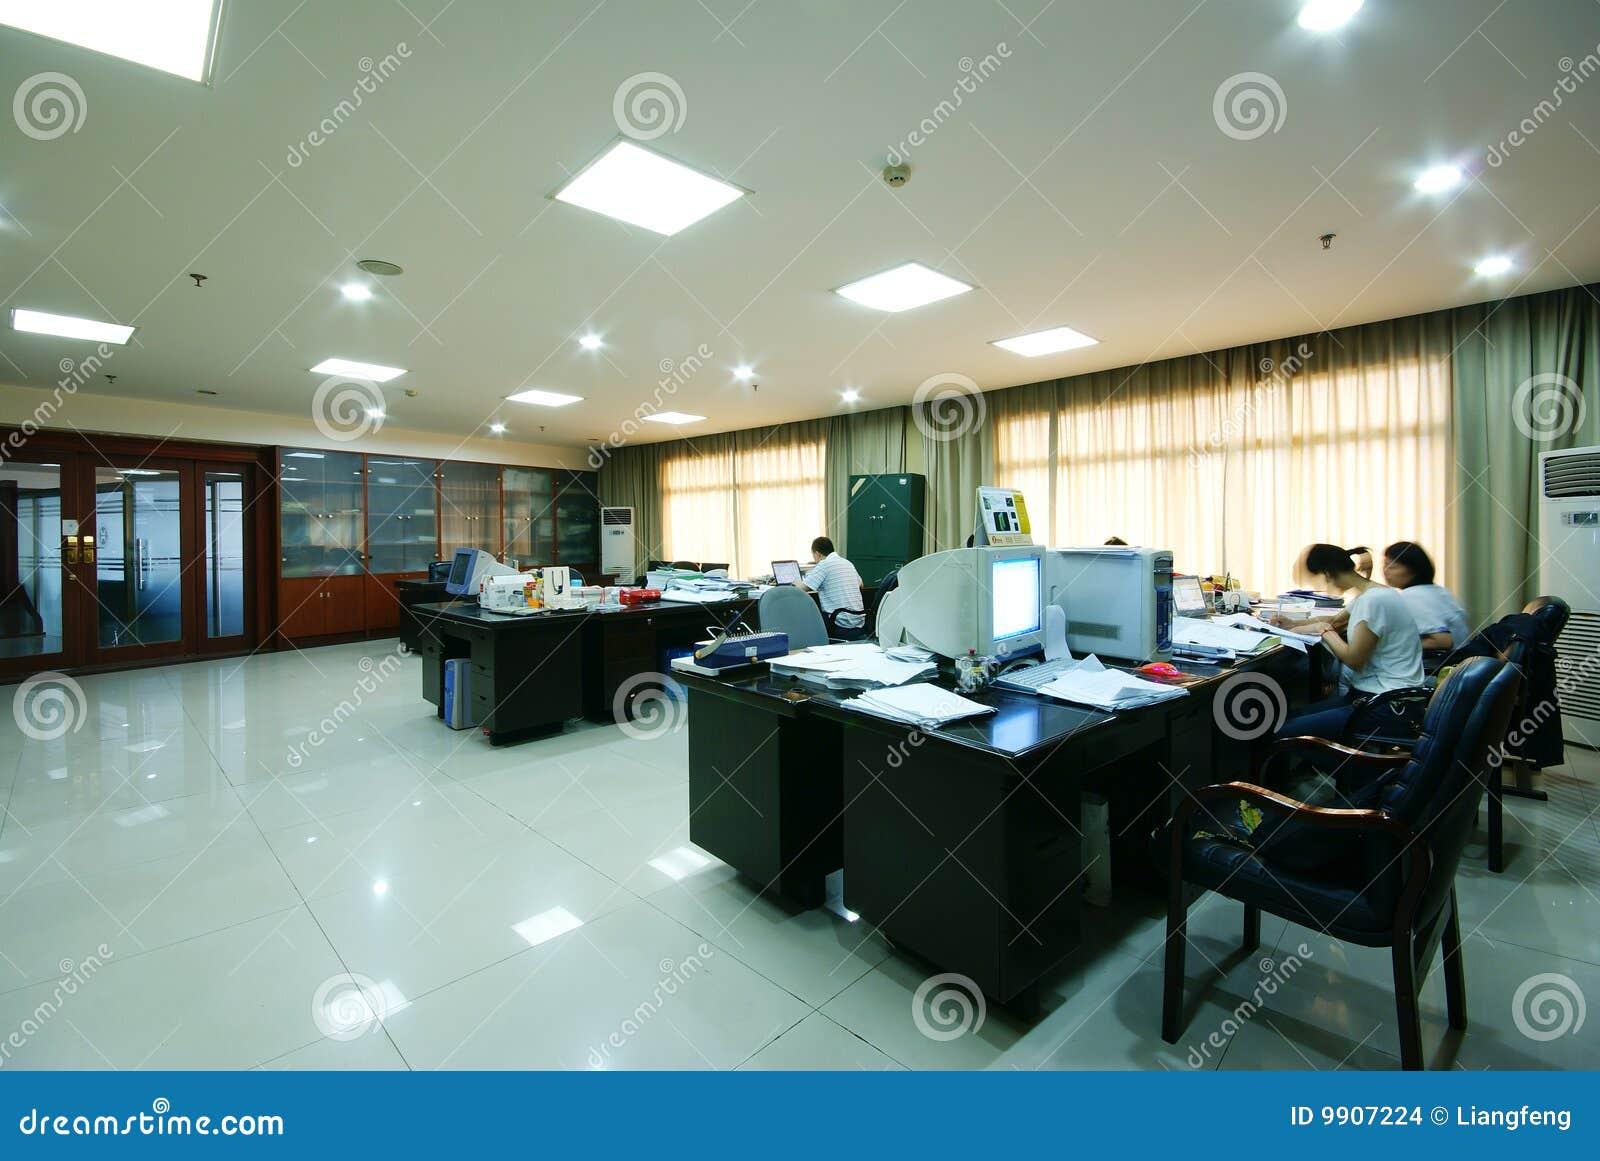 Company Office Royalty Free Stock Image CartoonDealer